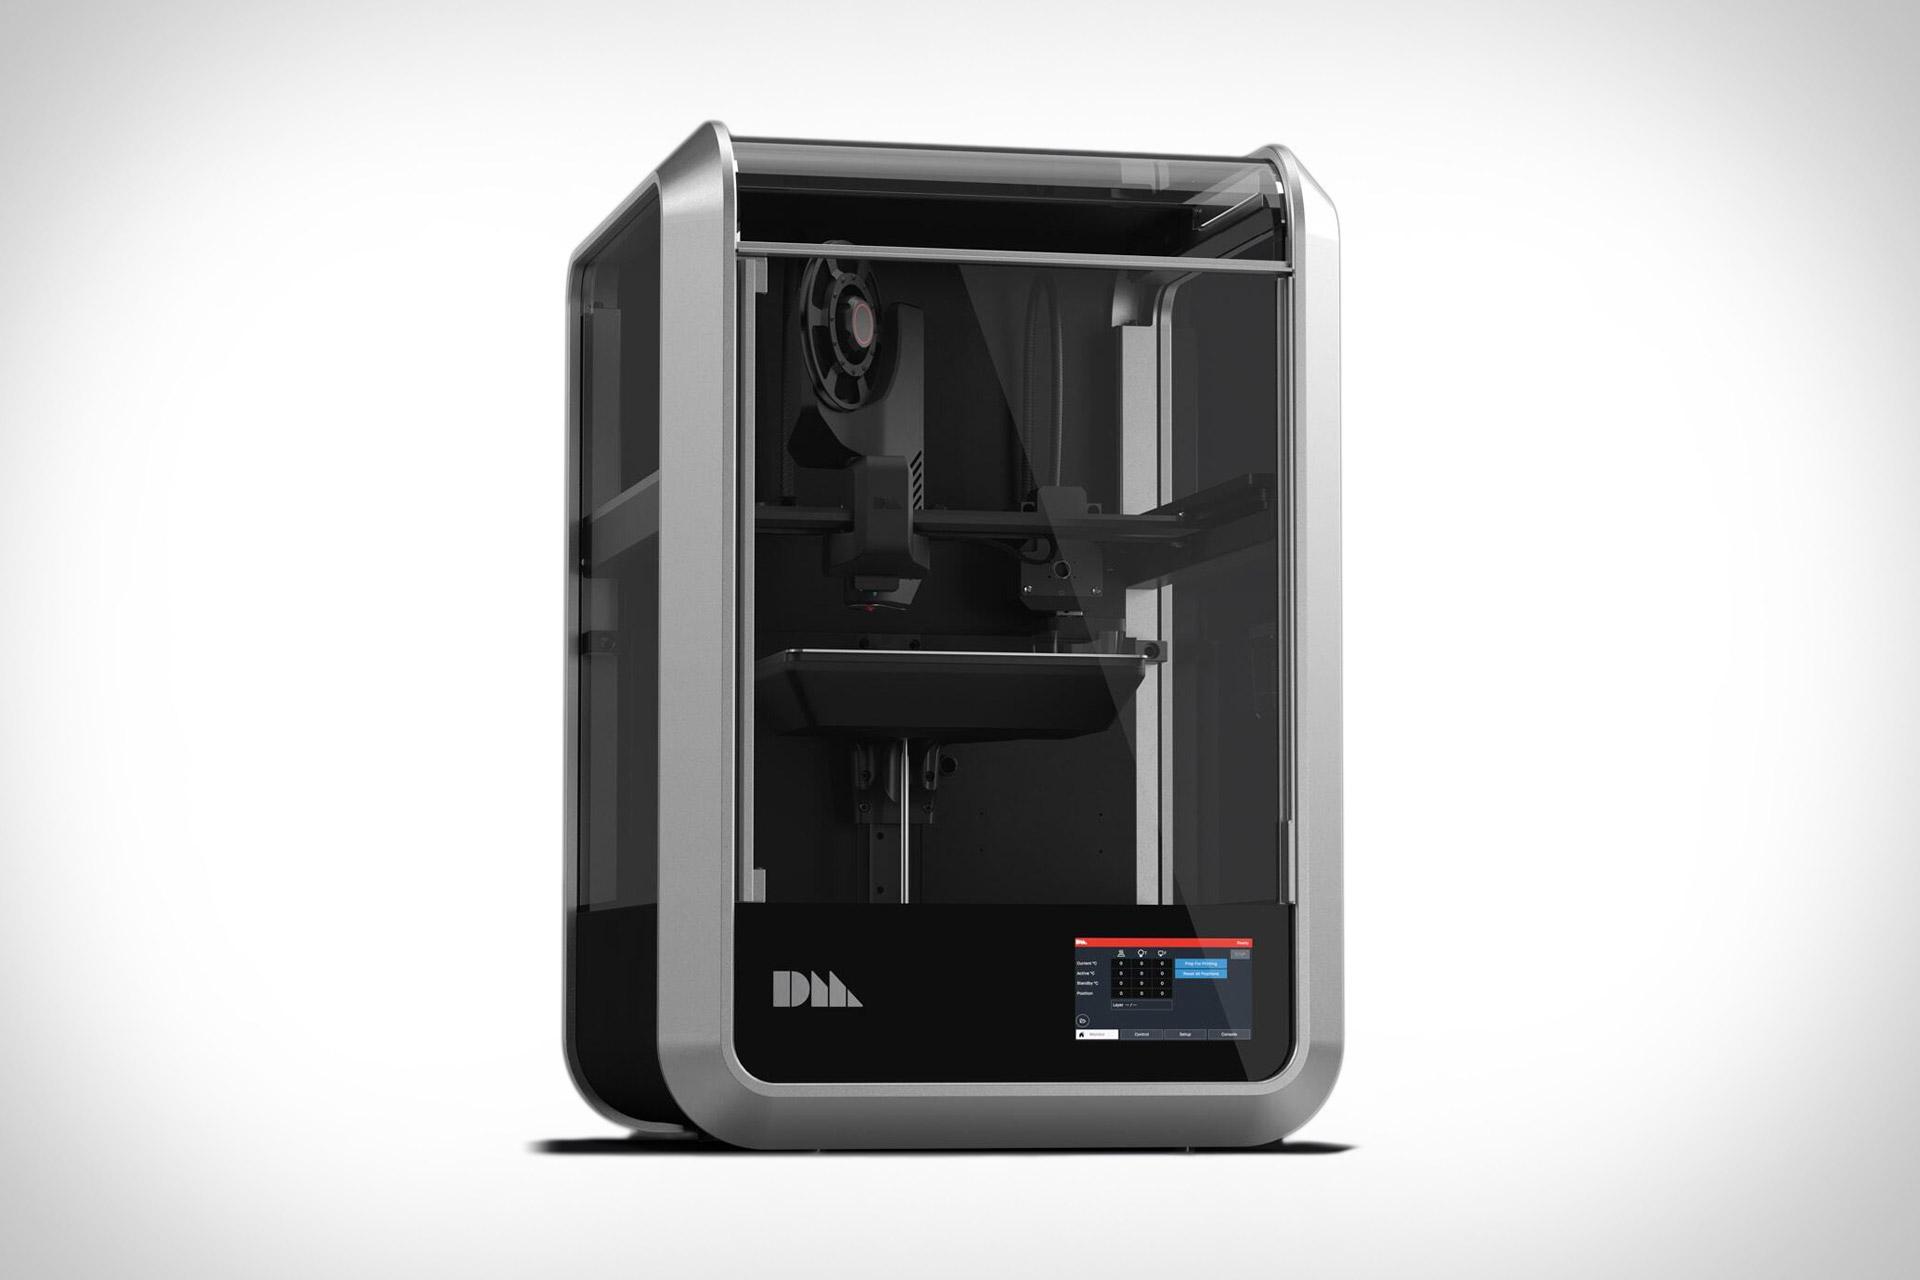 Desktop Metal Fiber 3D Printer